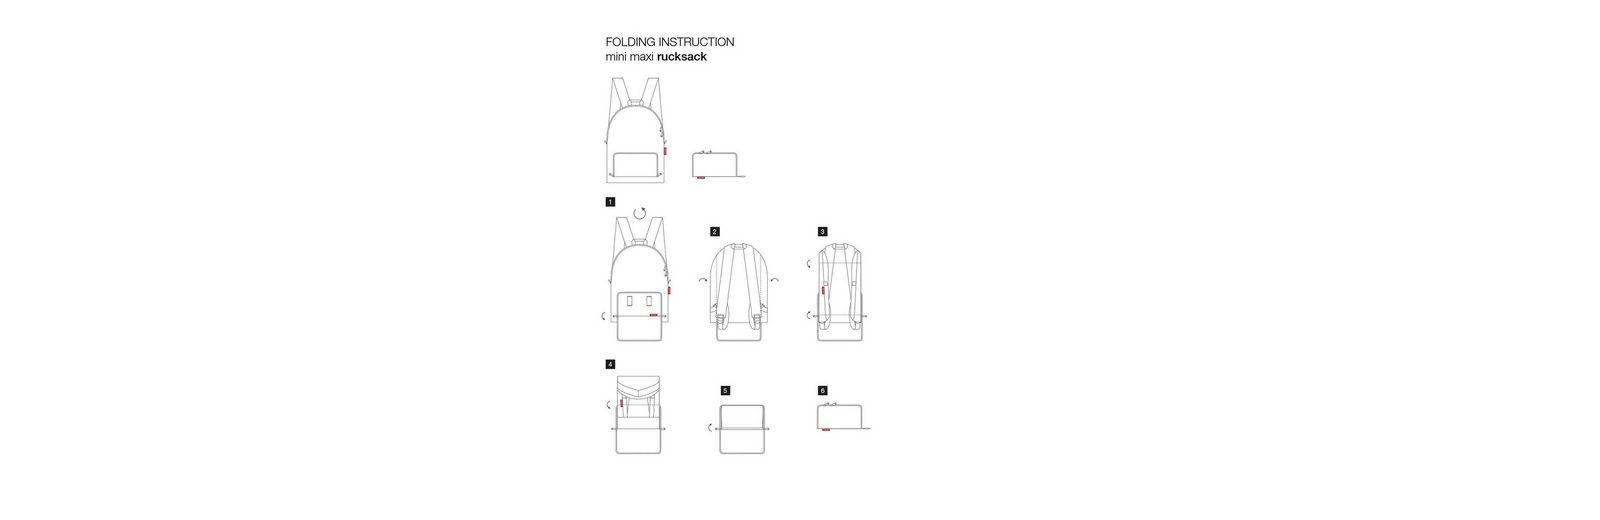 maxi maxi reisenthel rucksack Rucksack mini Rucksack rucksack reisenthel mini 4H6W60